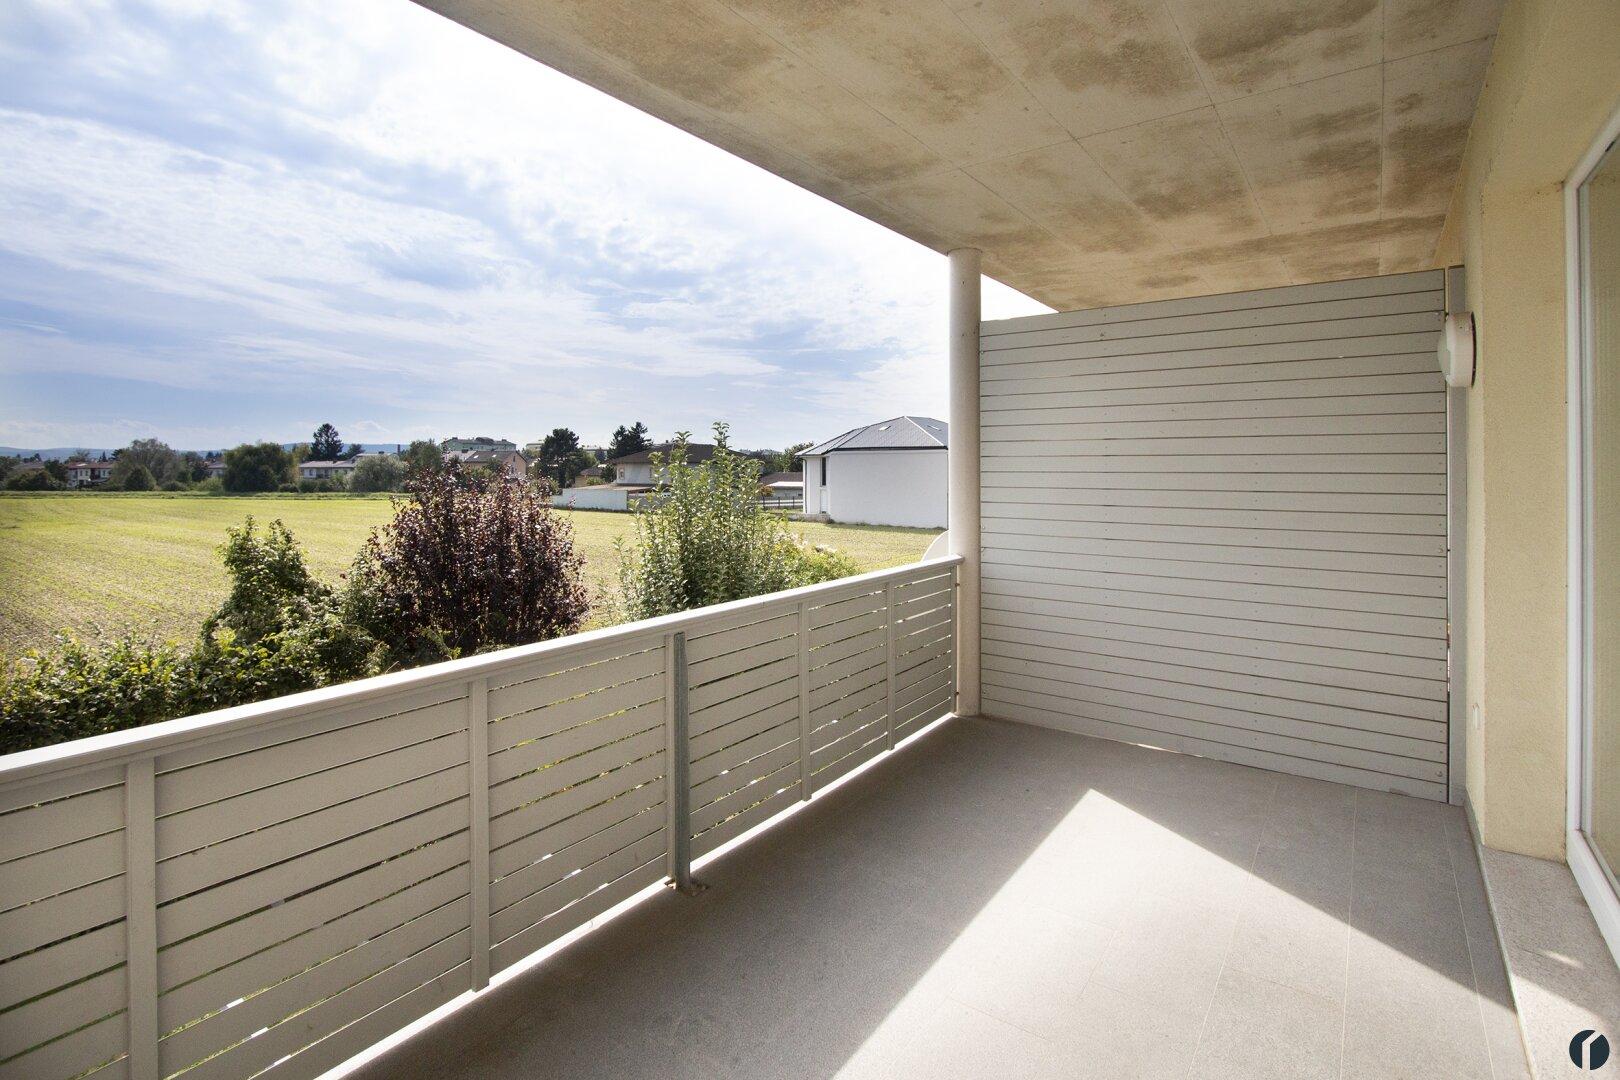 Süd-Balkon mit Blick ins Grüne